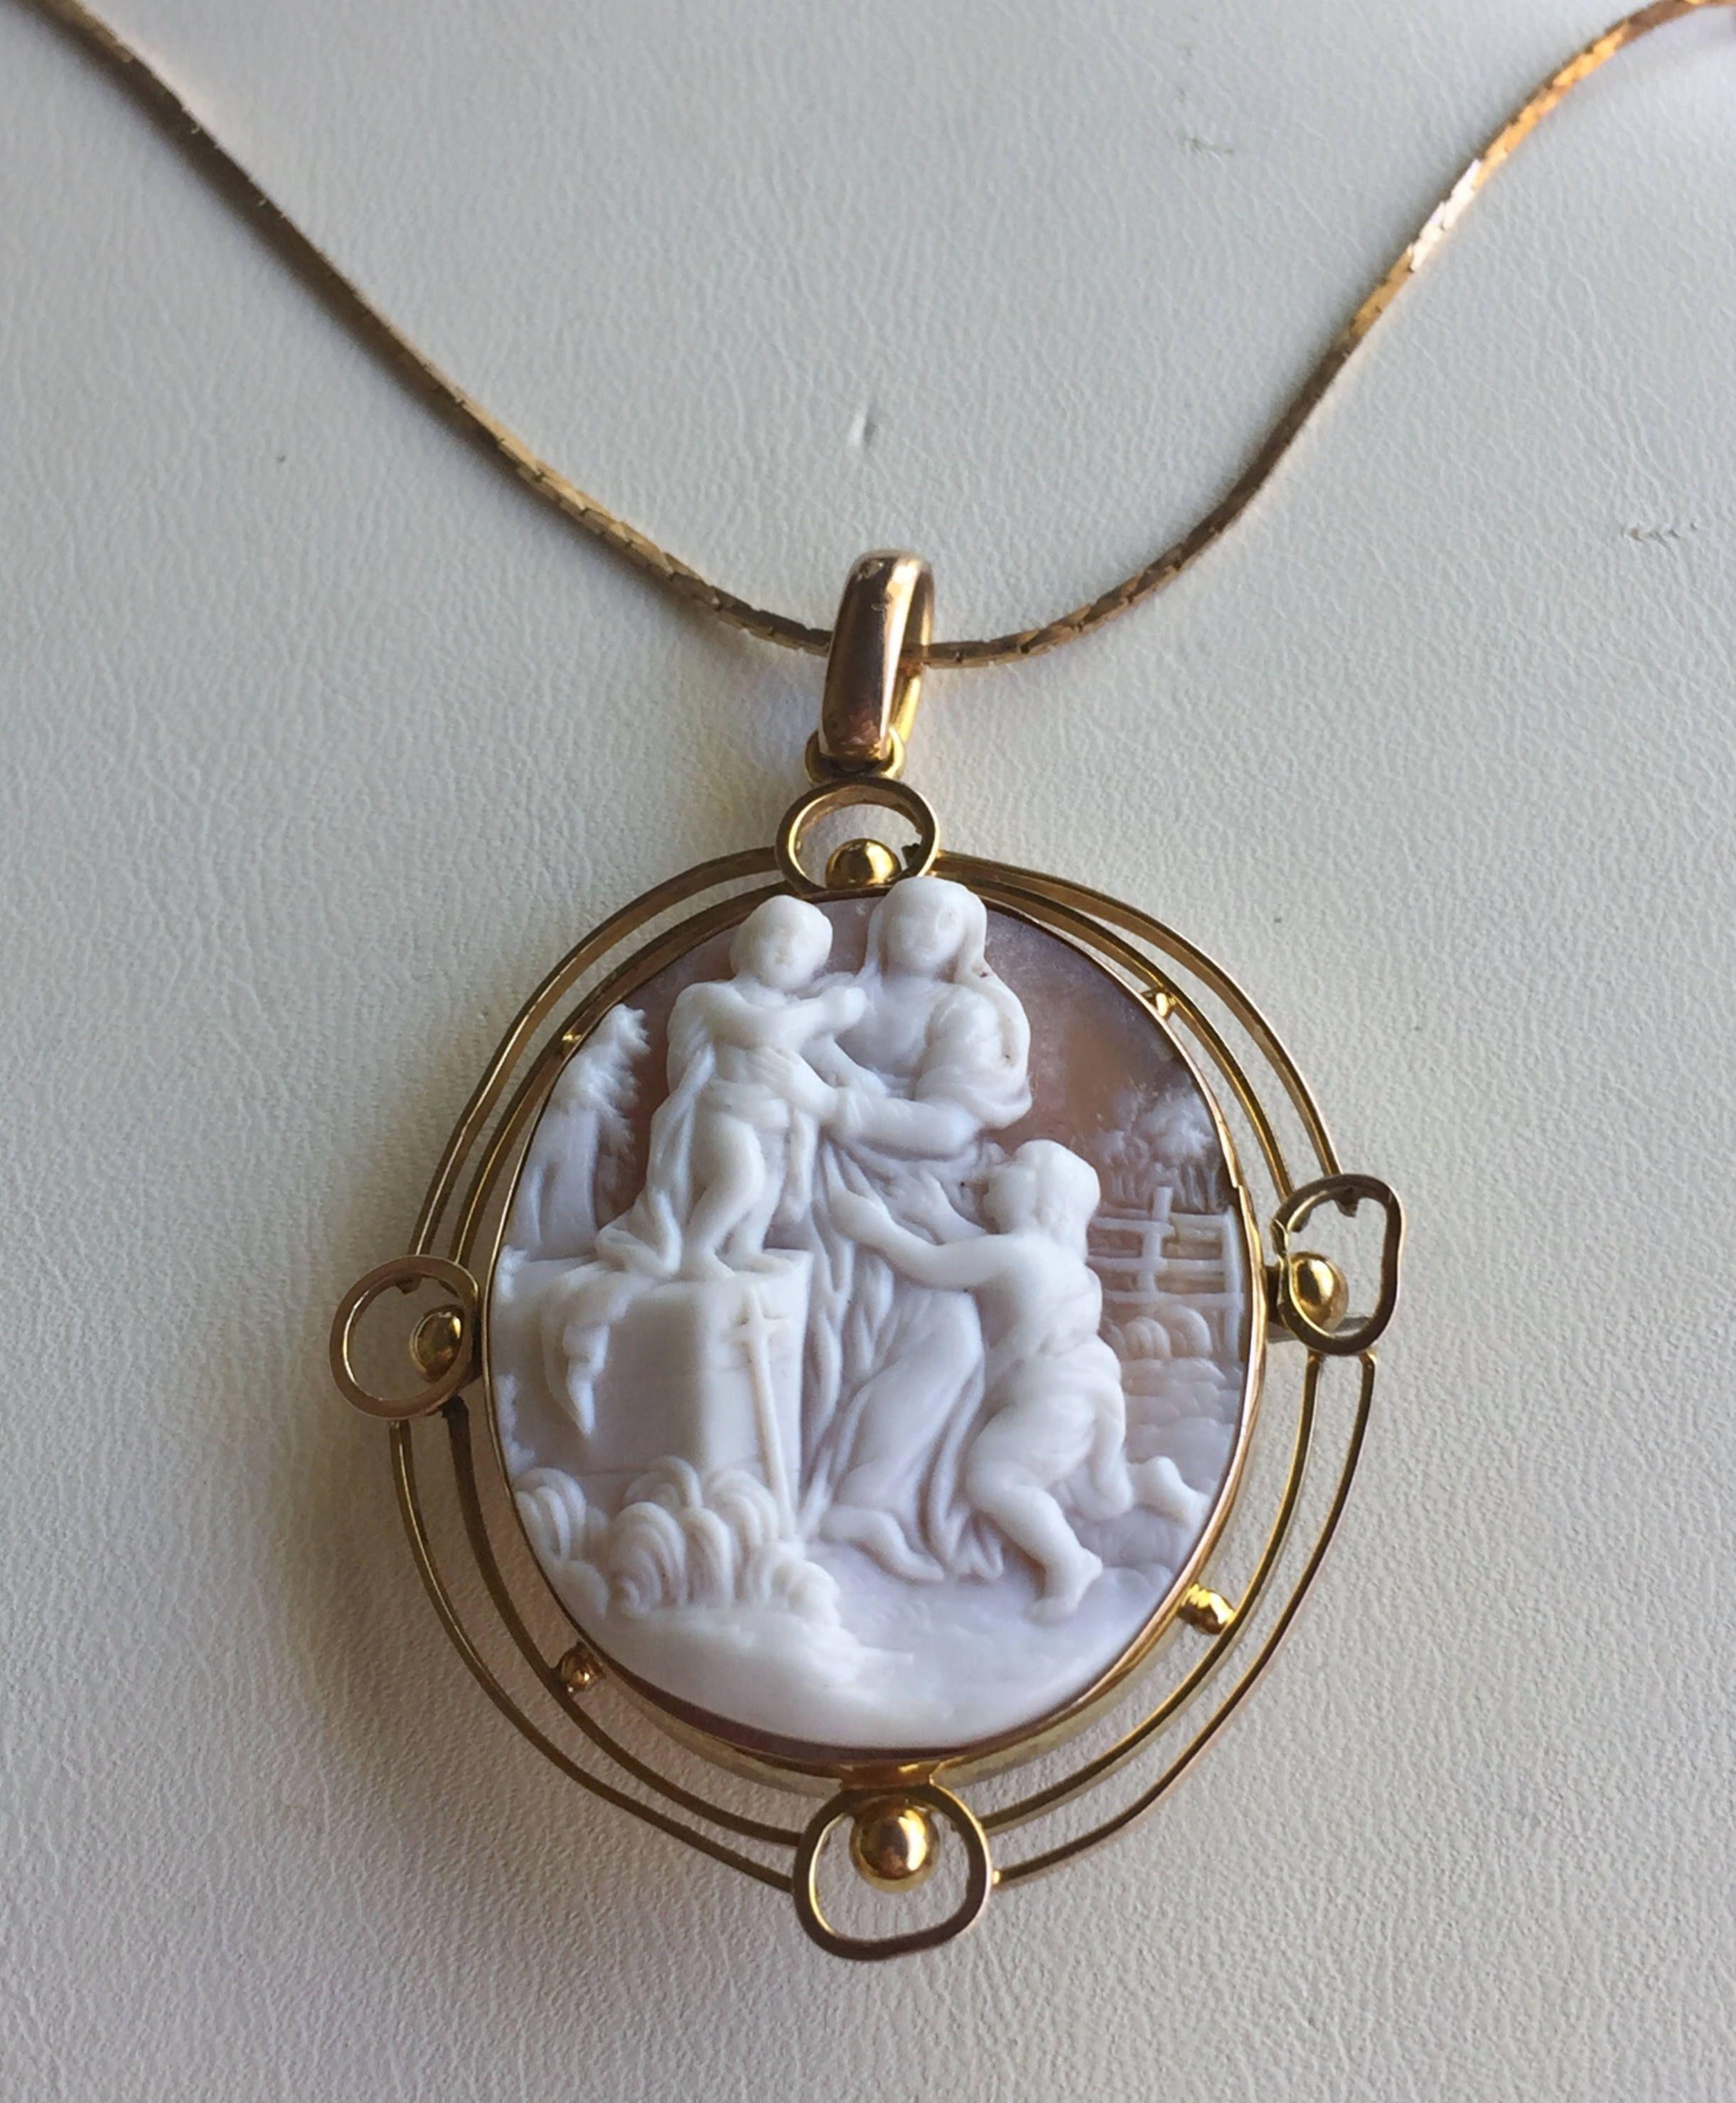 Victorian gold cameo pendant brooch rare biblical scene by victorian gold cameo pendant brooch rare biblical scene by victoriansentiments on etsy aloadofball Images